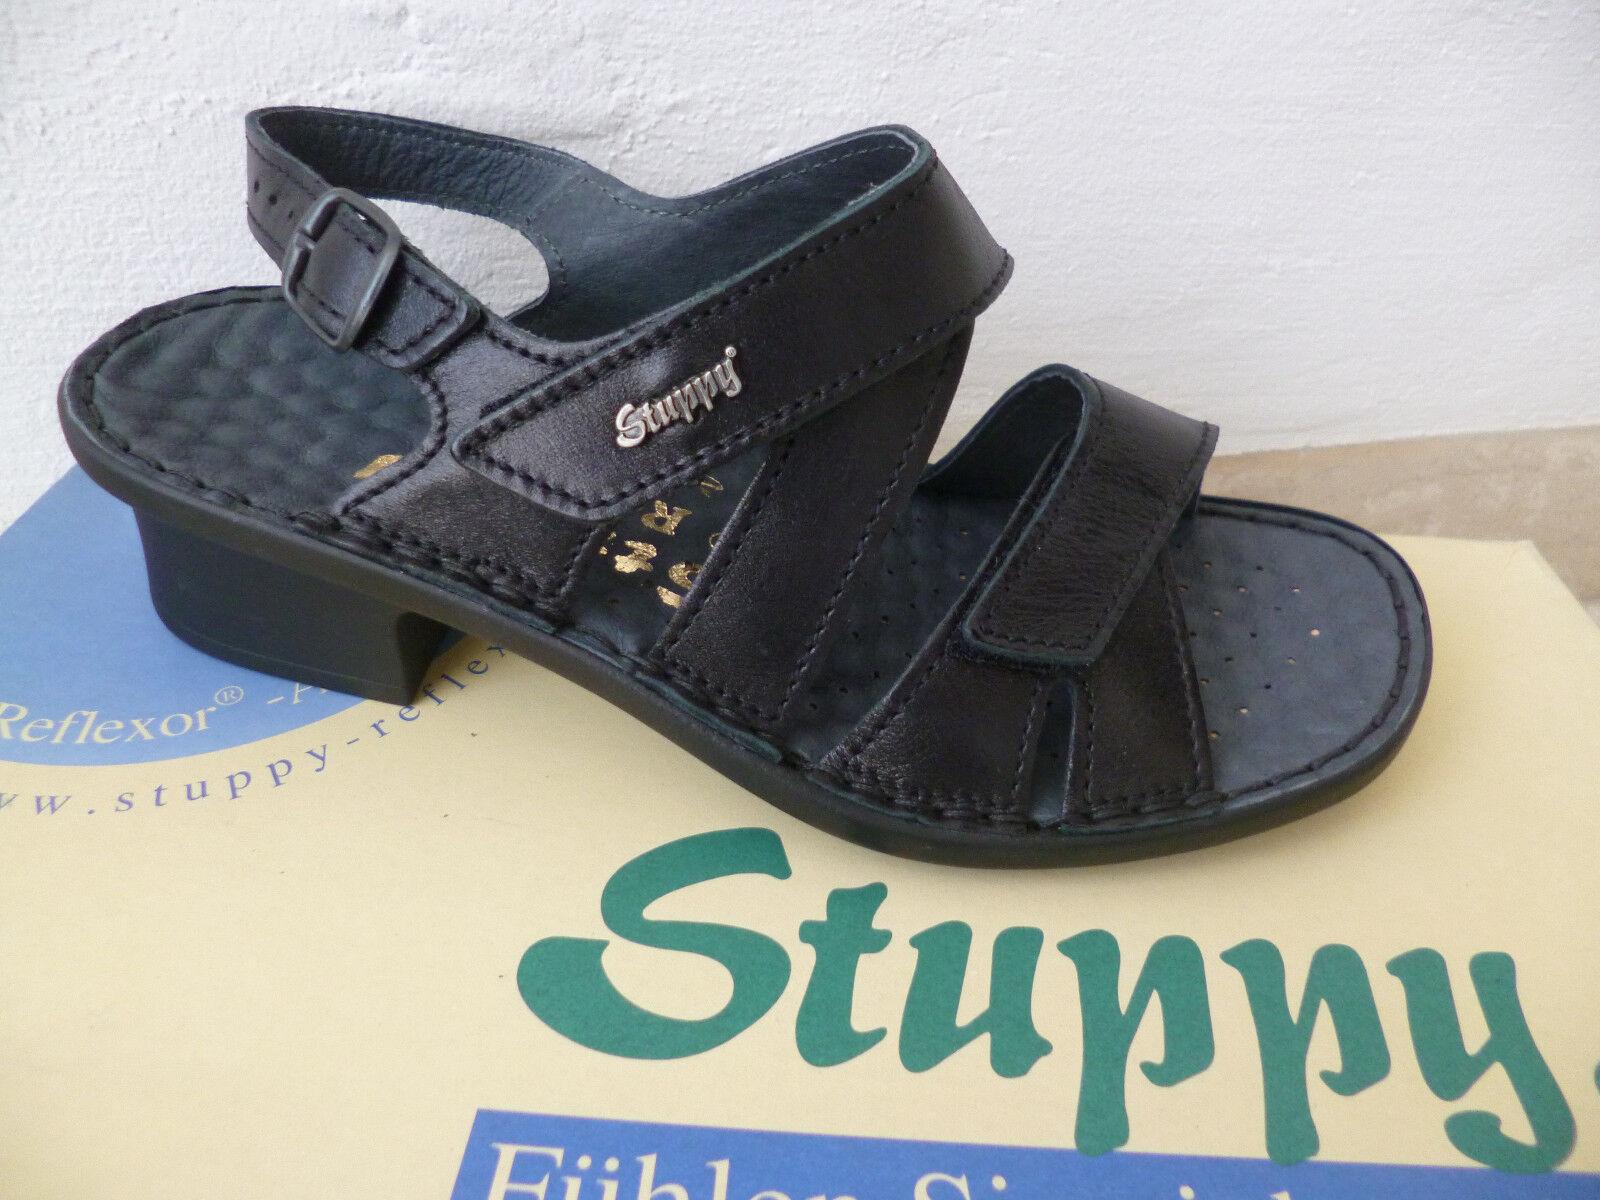 Stuppy Damen Sandale Sandalette Echtleder schwarz Neu